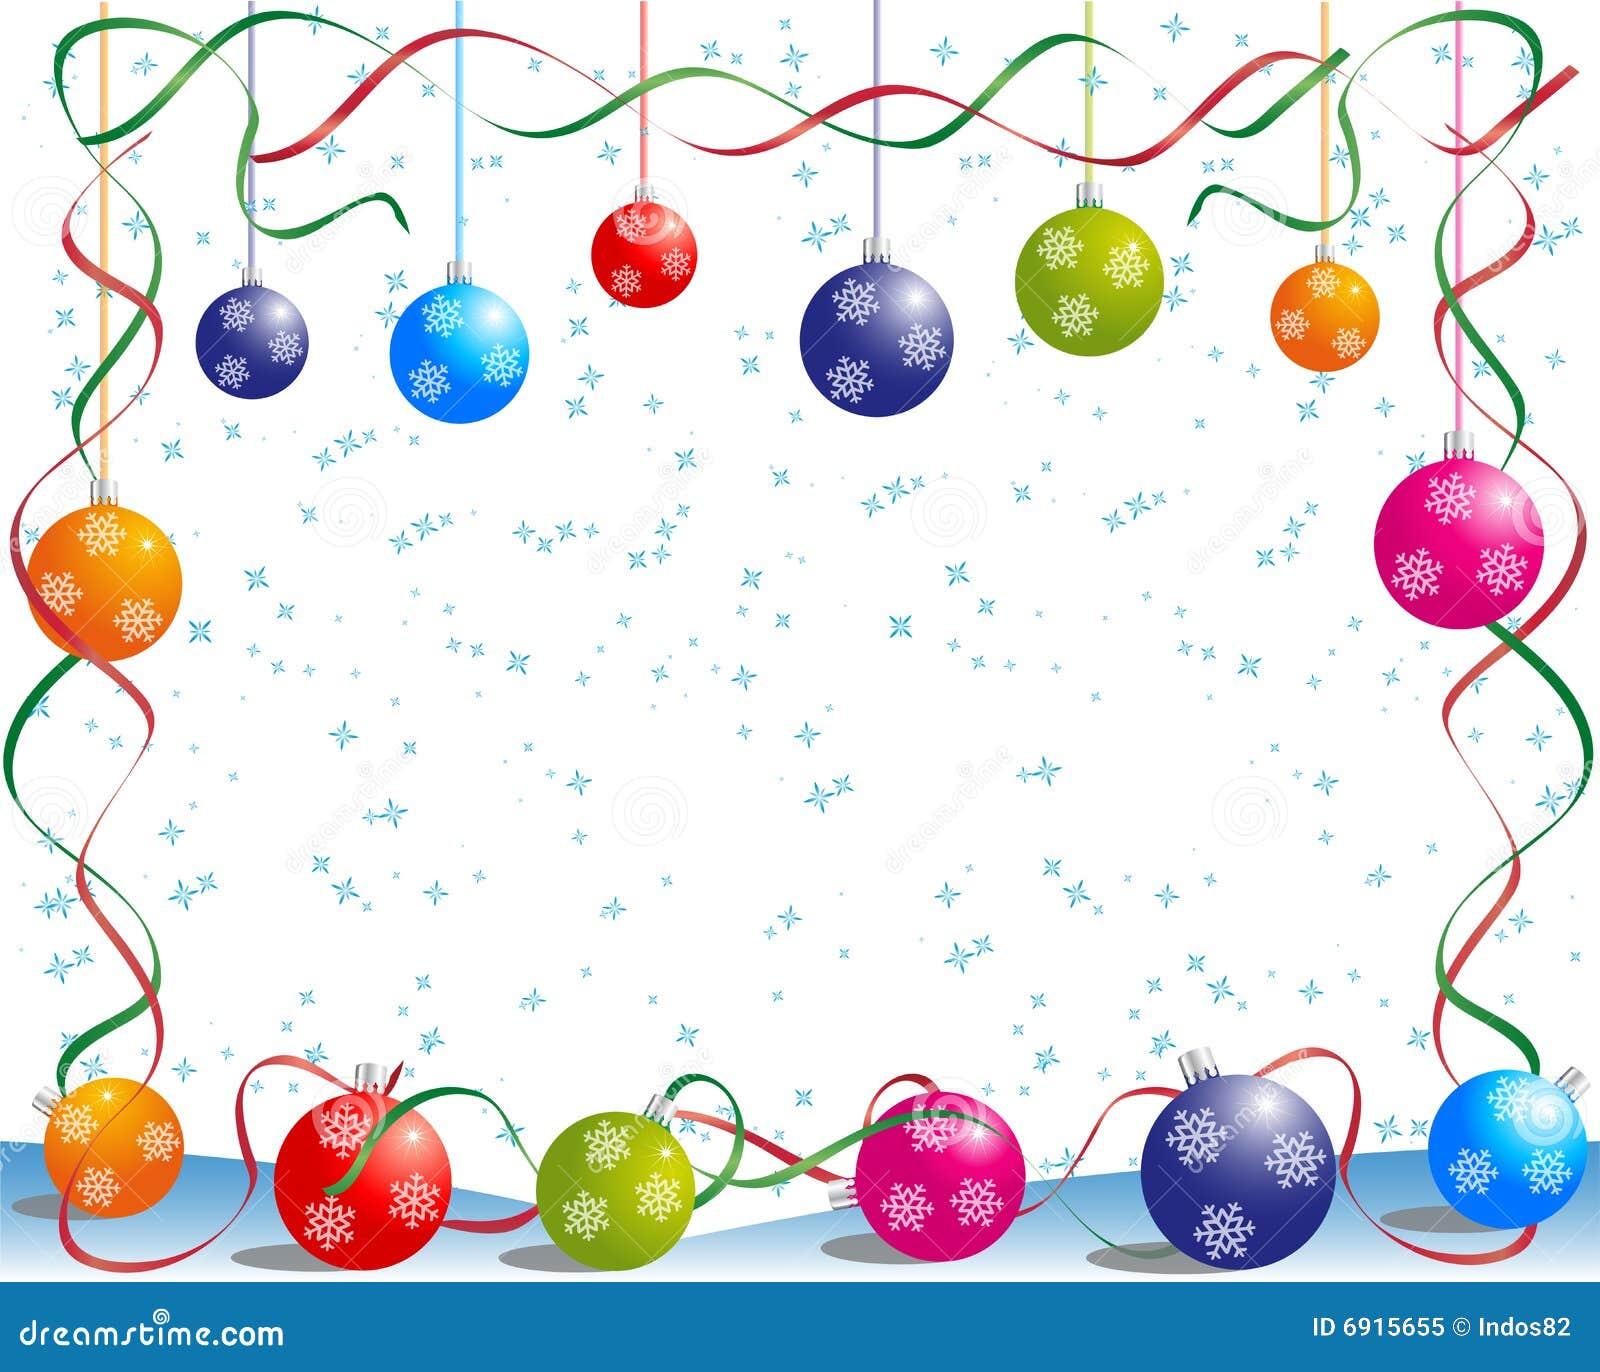 christmas design royalty free stock photo - image: 6915655